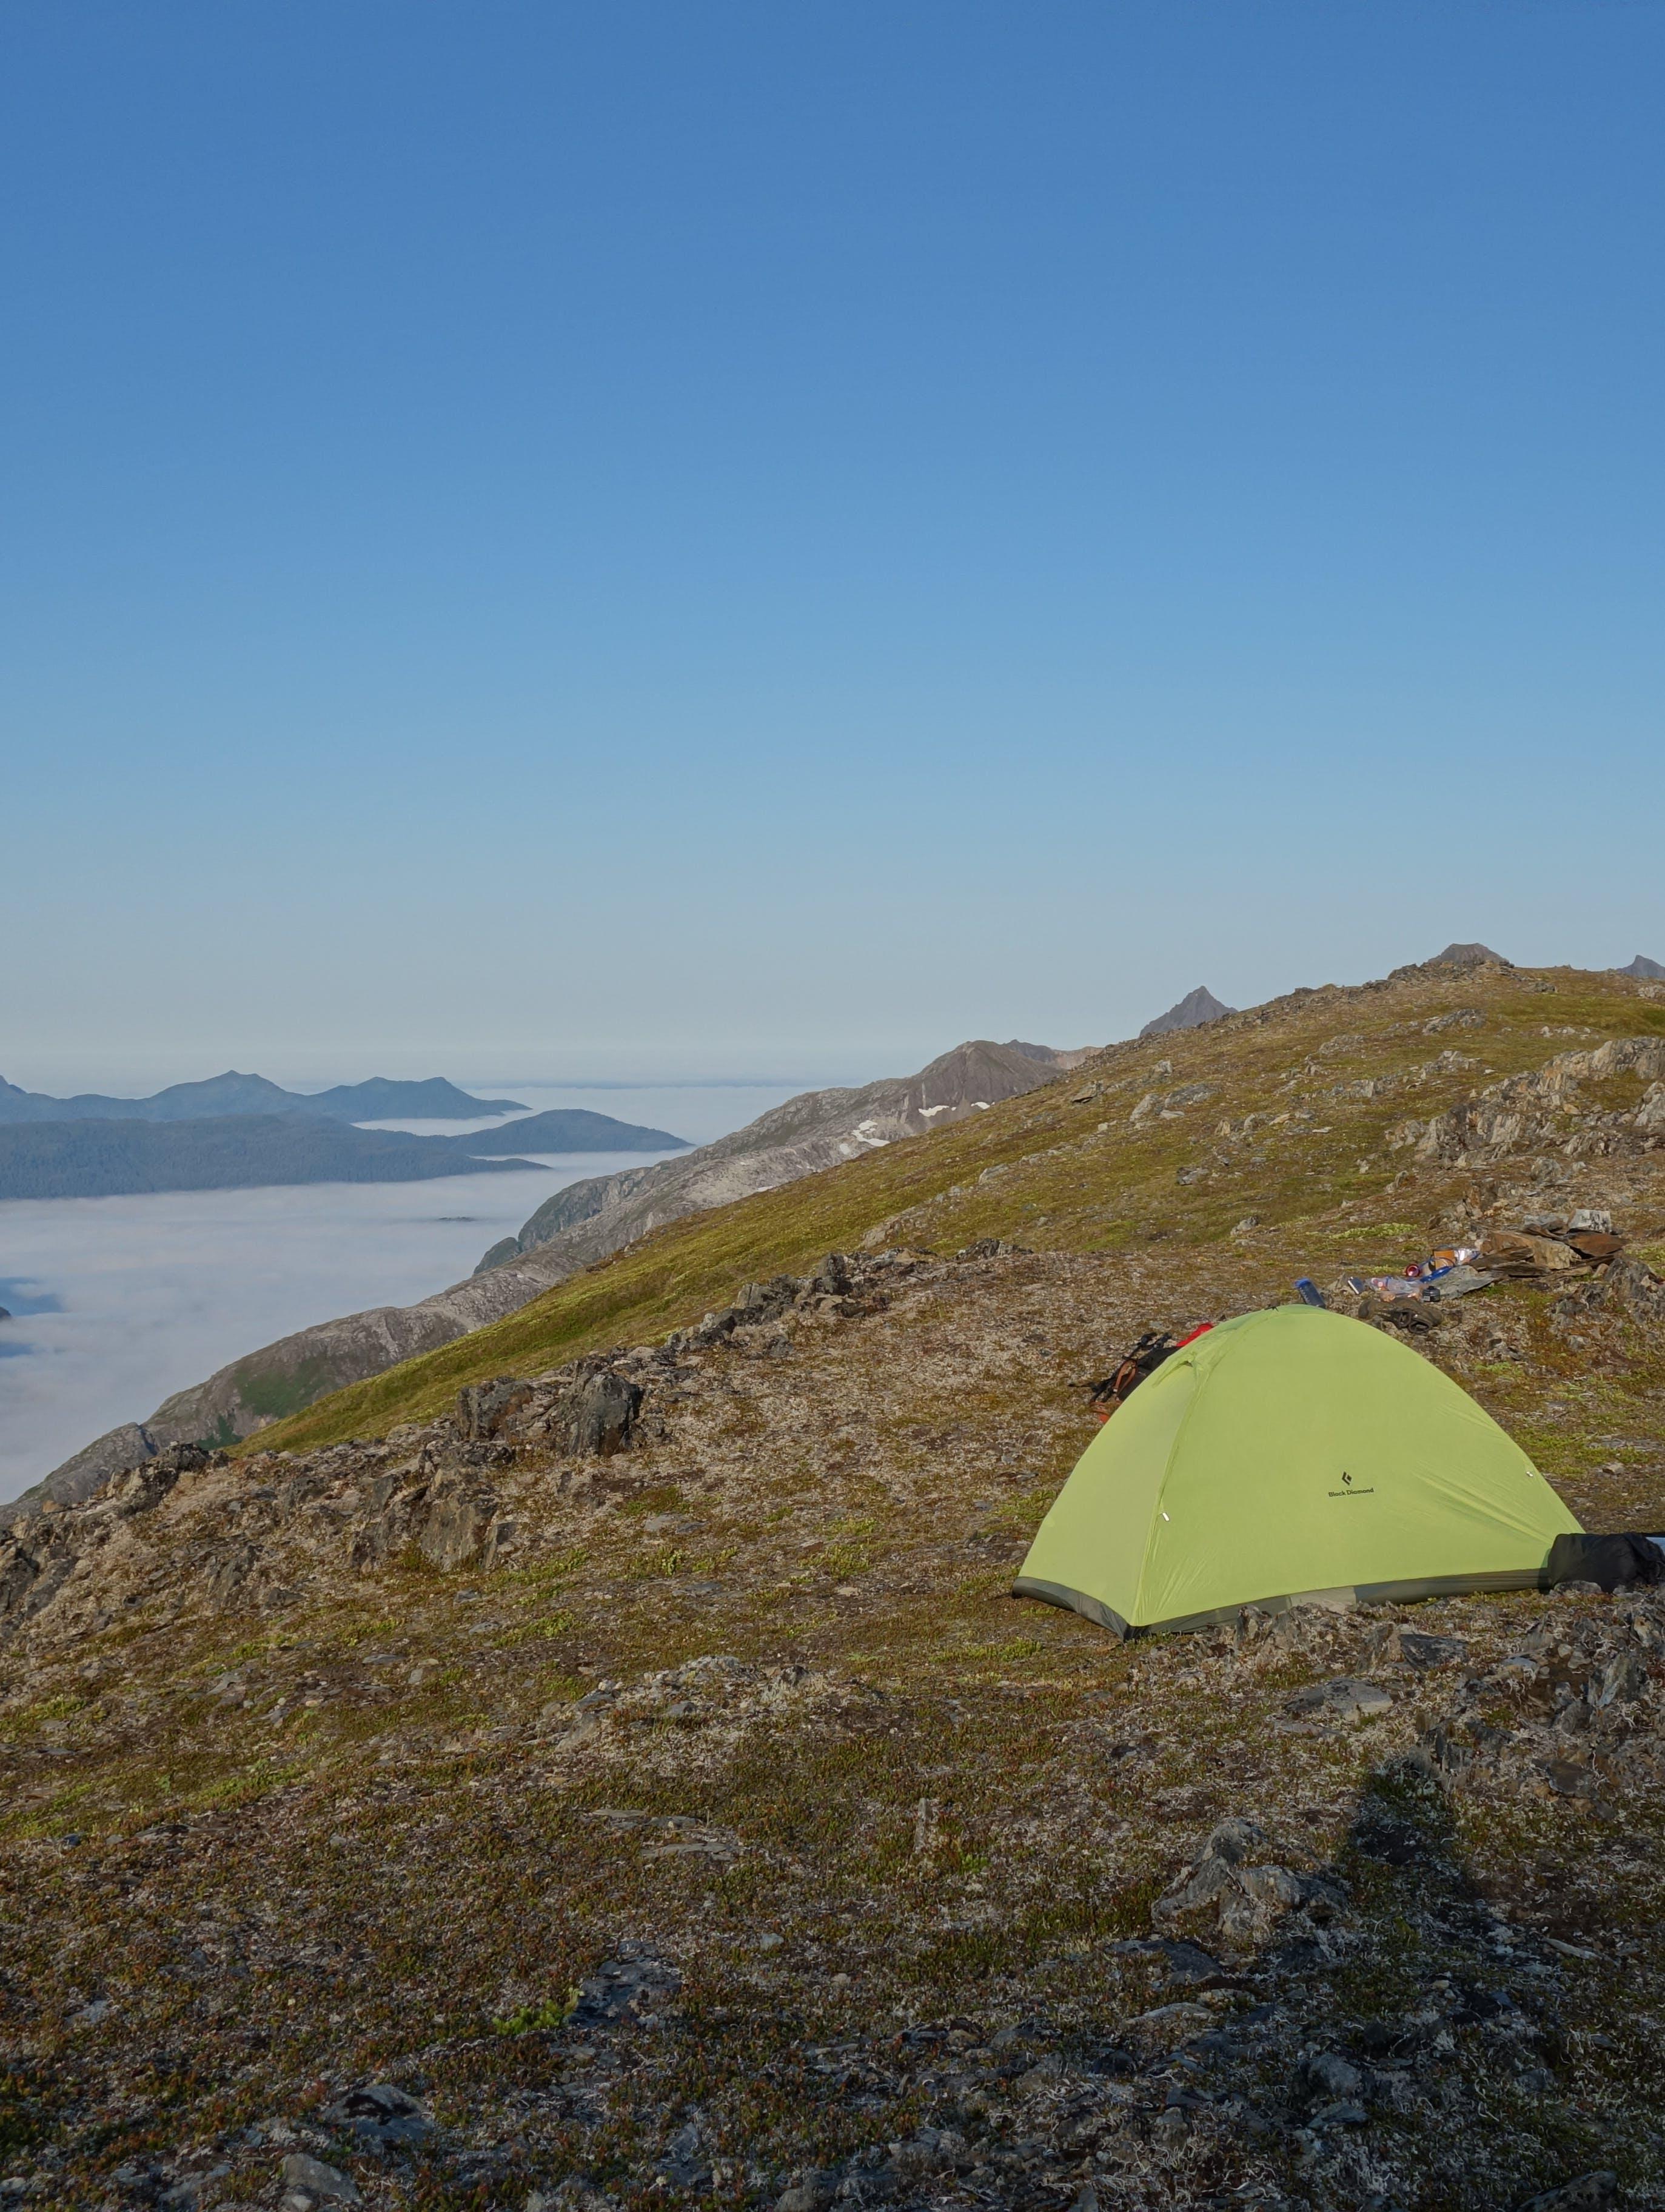 Camping & Hiking Expert Fabio D.